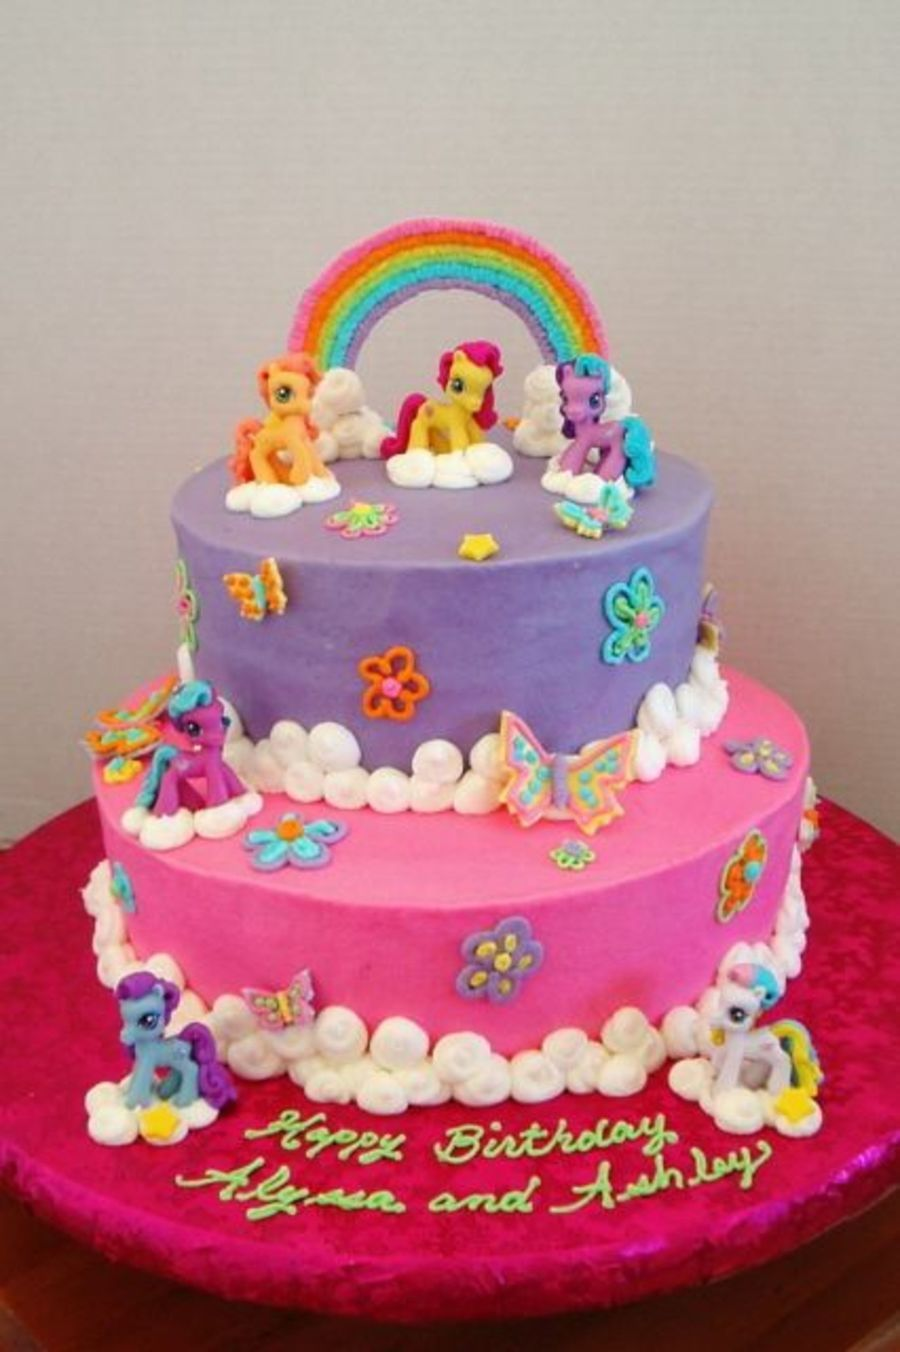 My Little Pony on Cake Central Recipes Pinterest Cake